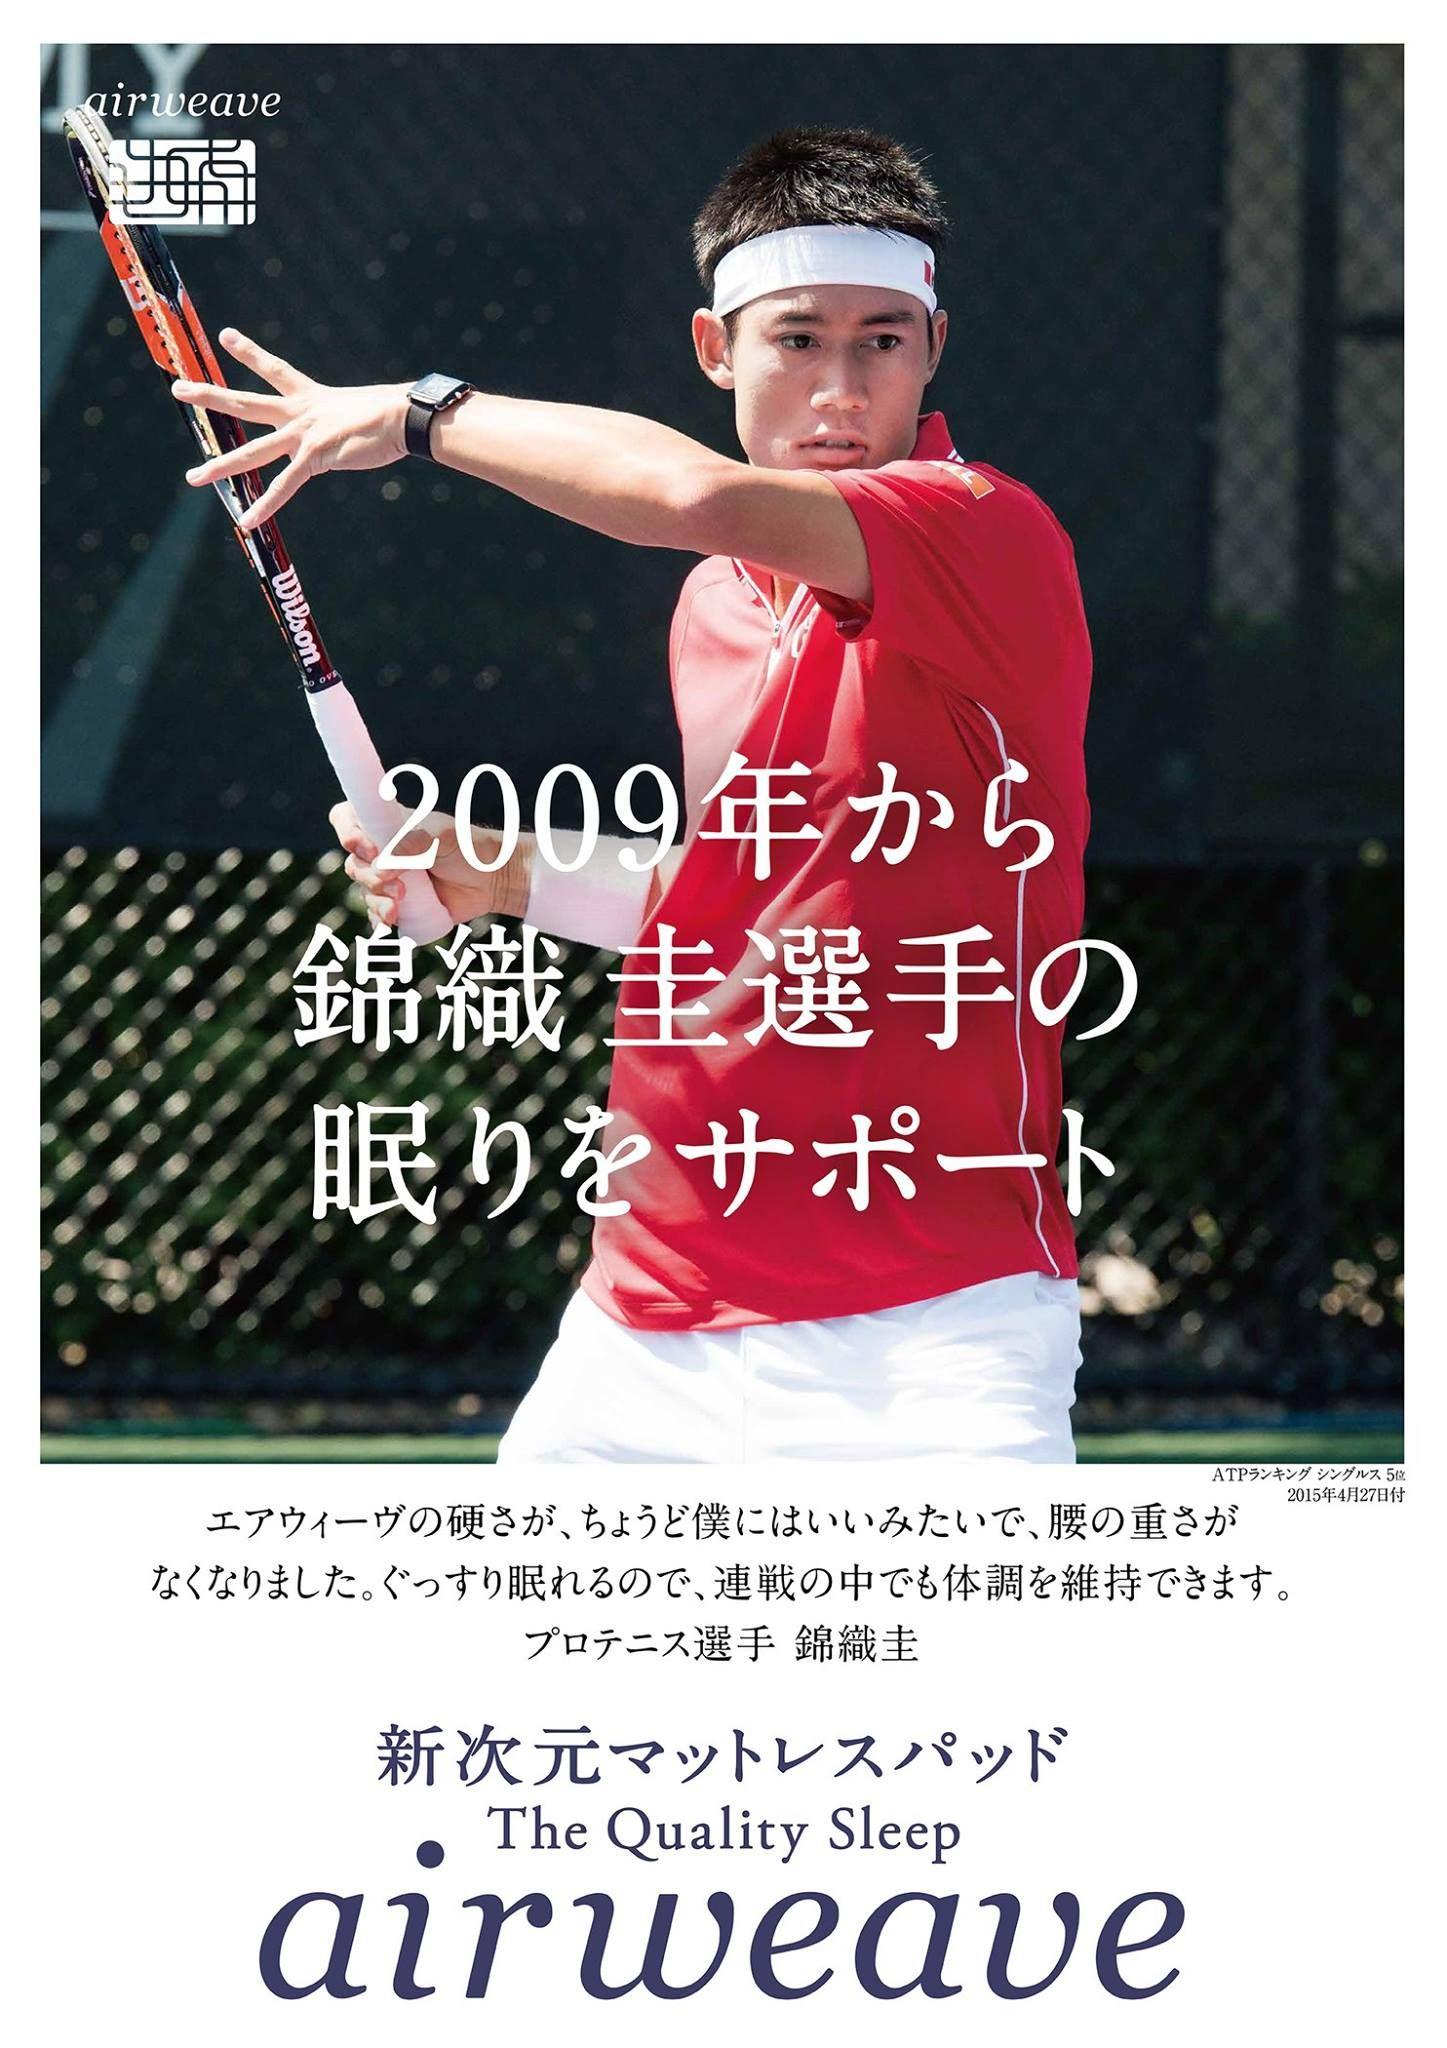 airweave広告 錦織圭さん撮影